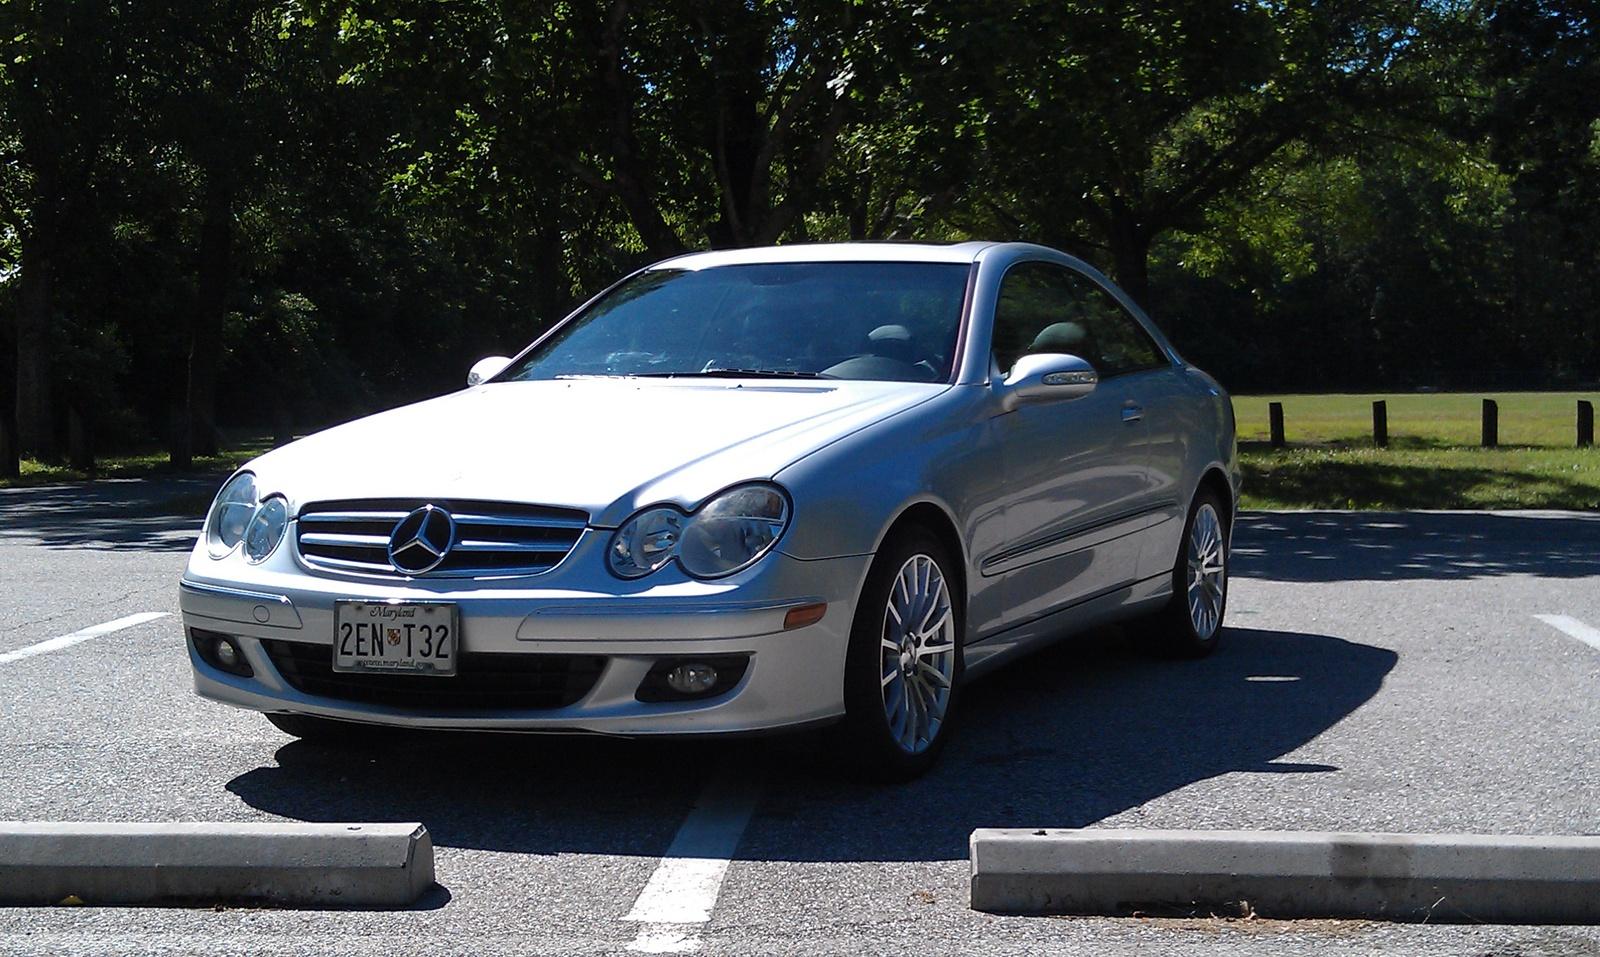 2006 mercedes benz clk class pictures cargurus for Mercedes benz clk350 price